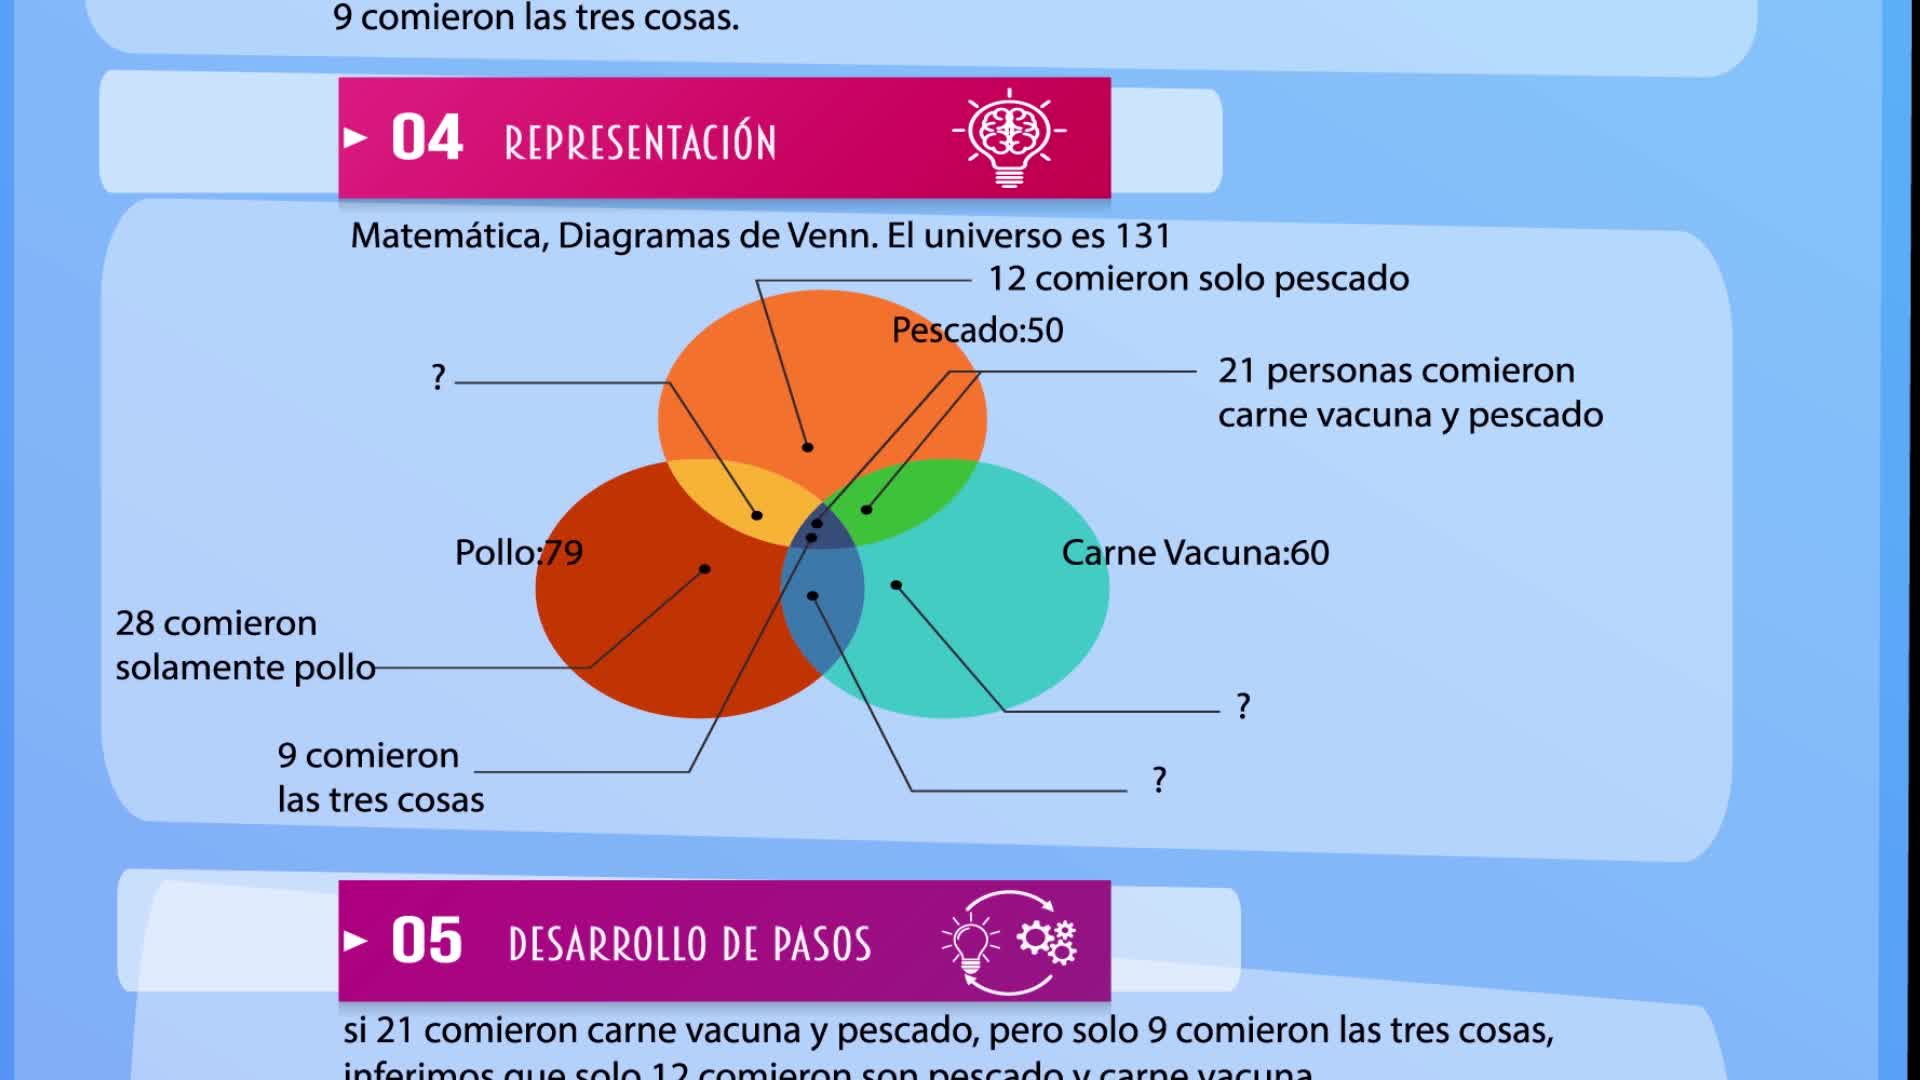 Resolviendo Problemas con Diagramas de Venn